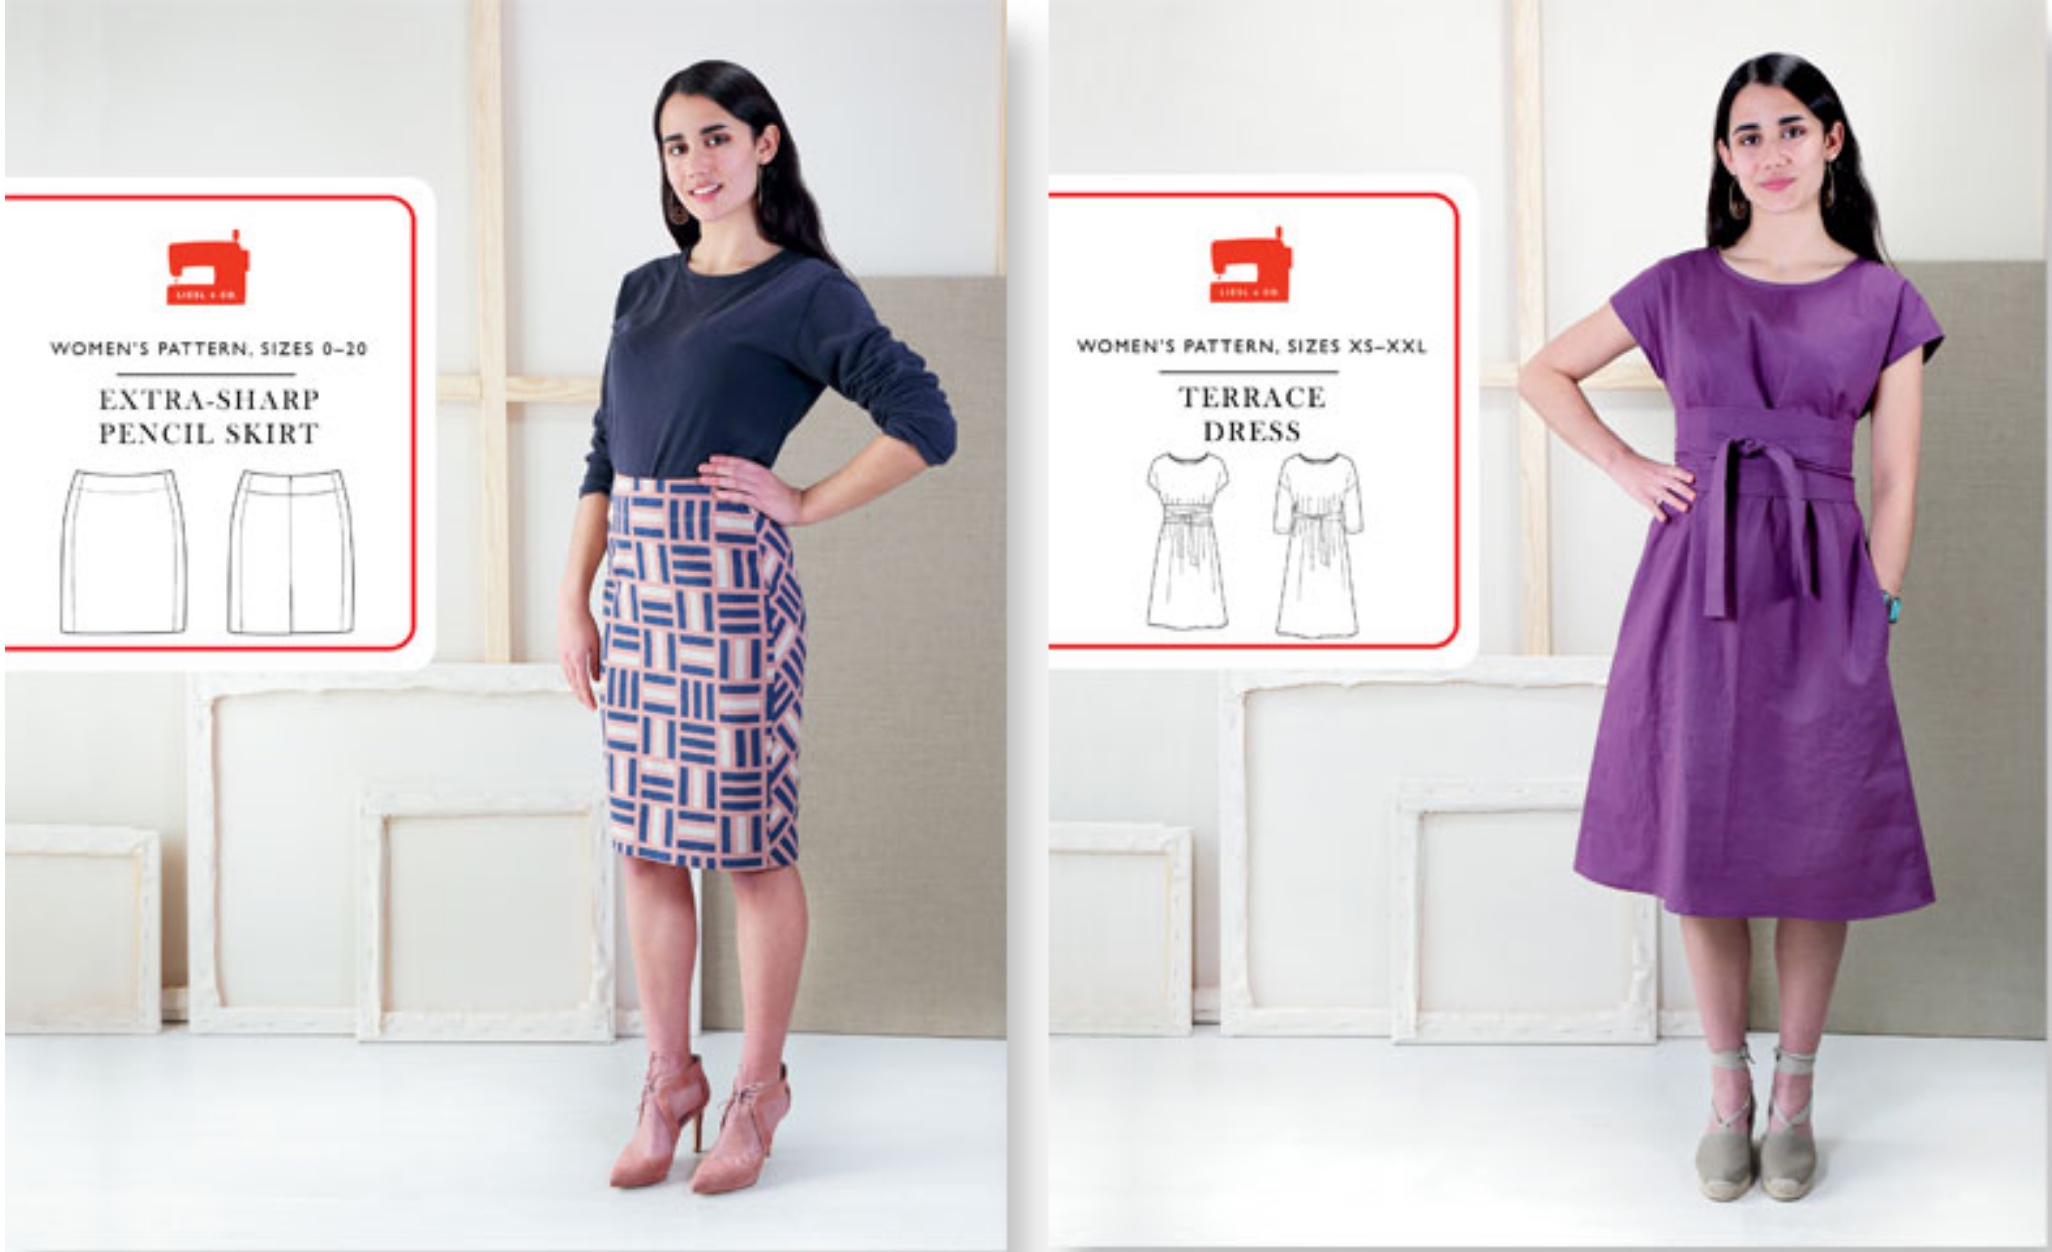 Leisl & Co - pencil skirt and Terrace dress.jpeg